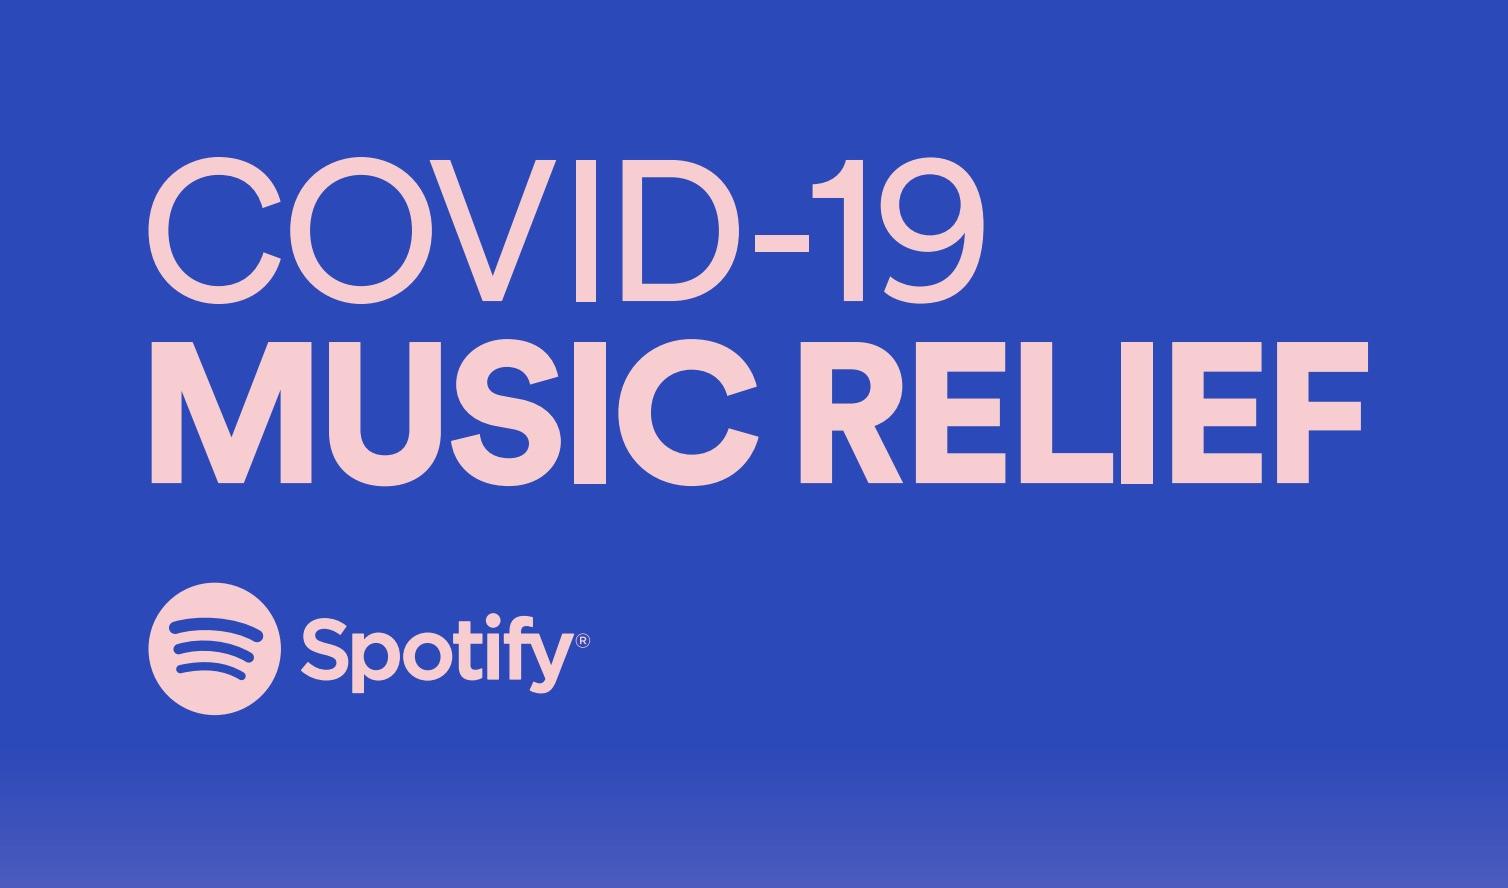 Spotify COVID-19 Music Relief Logo